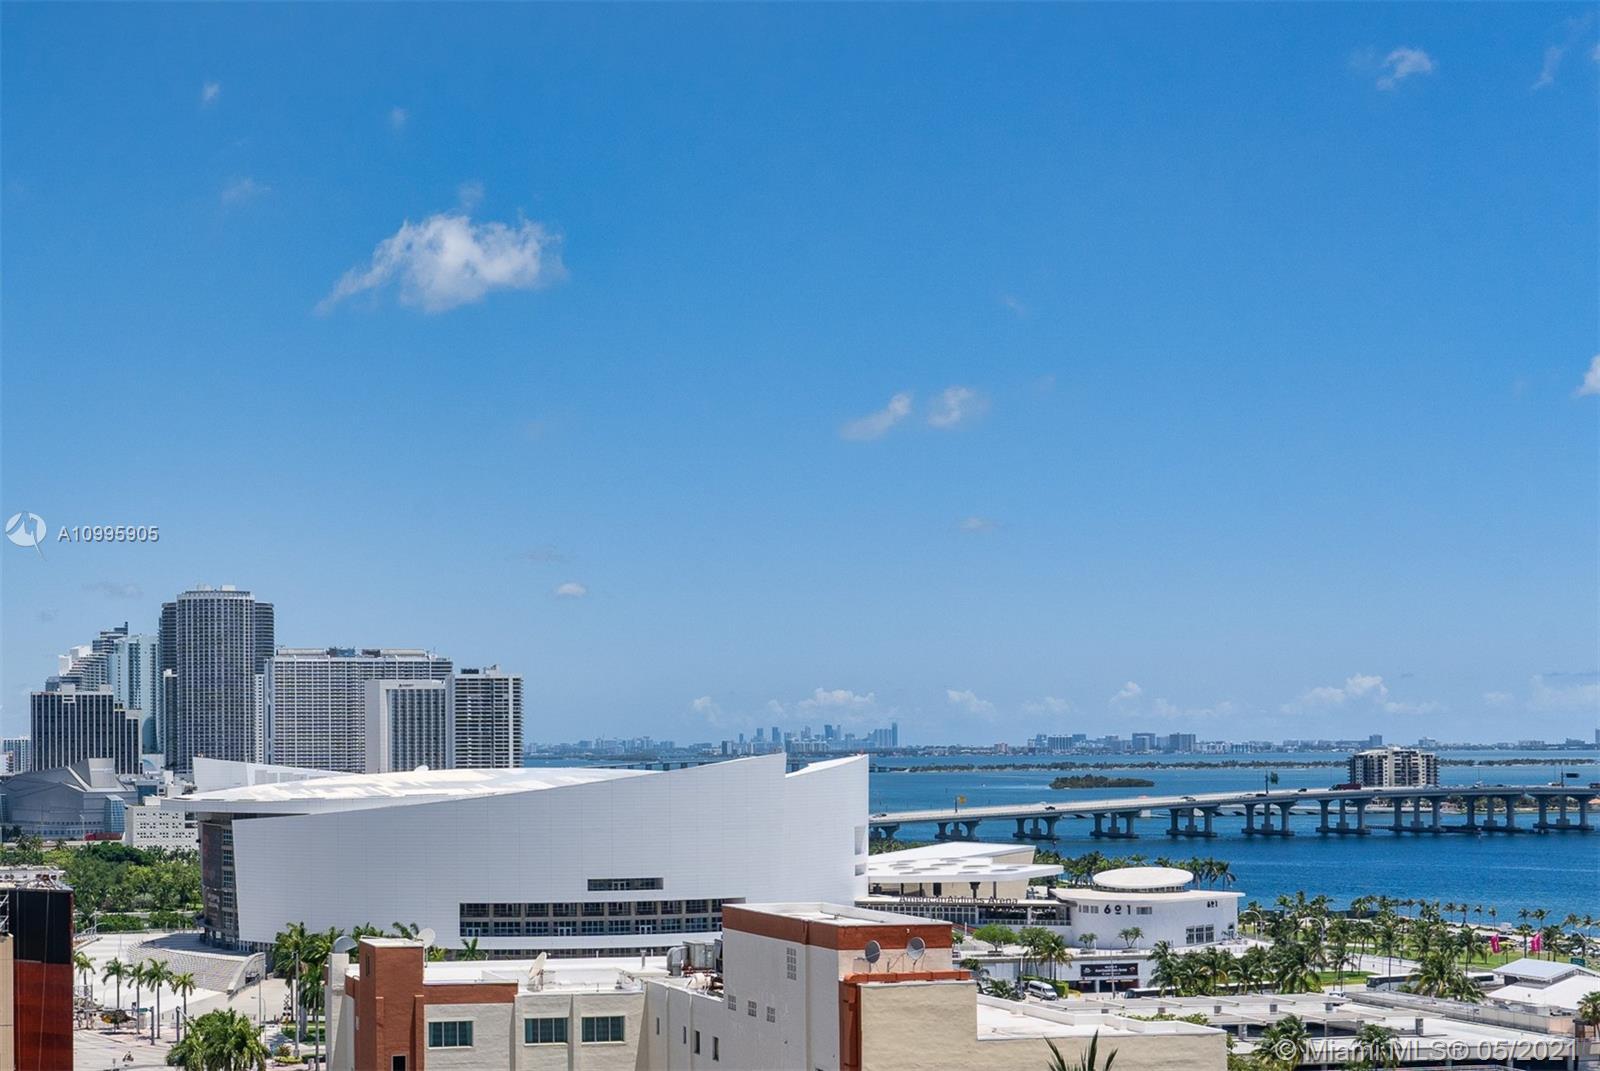 Vizcayne Two #1502 - 253 NE 2 ST #1502, Miami, FL 33132